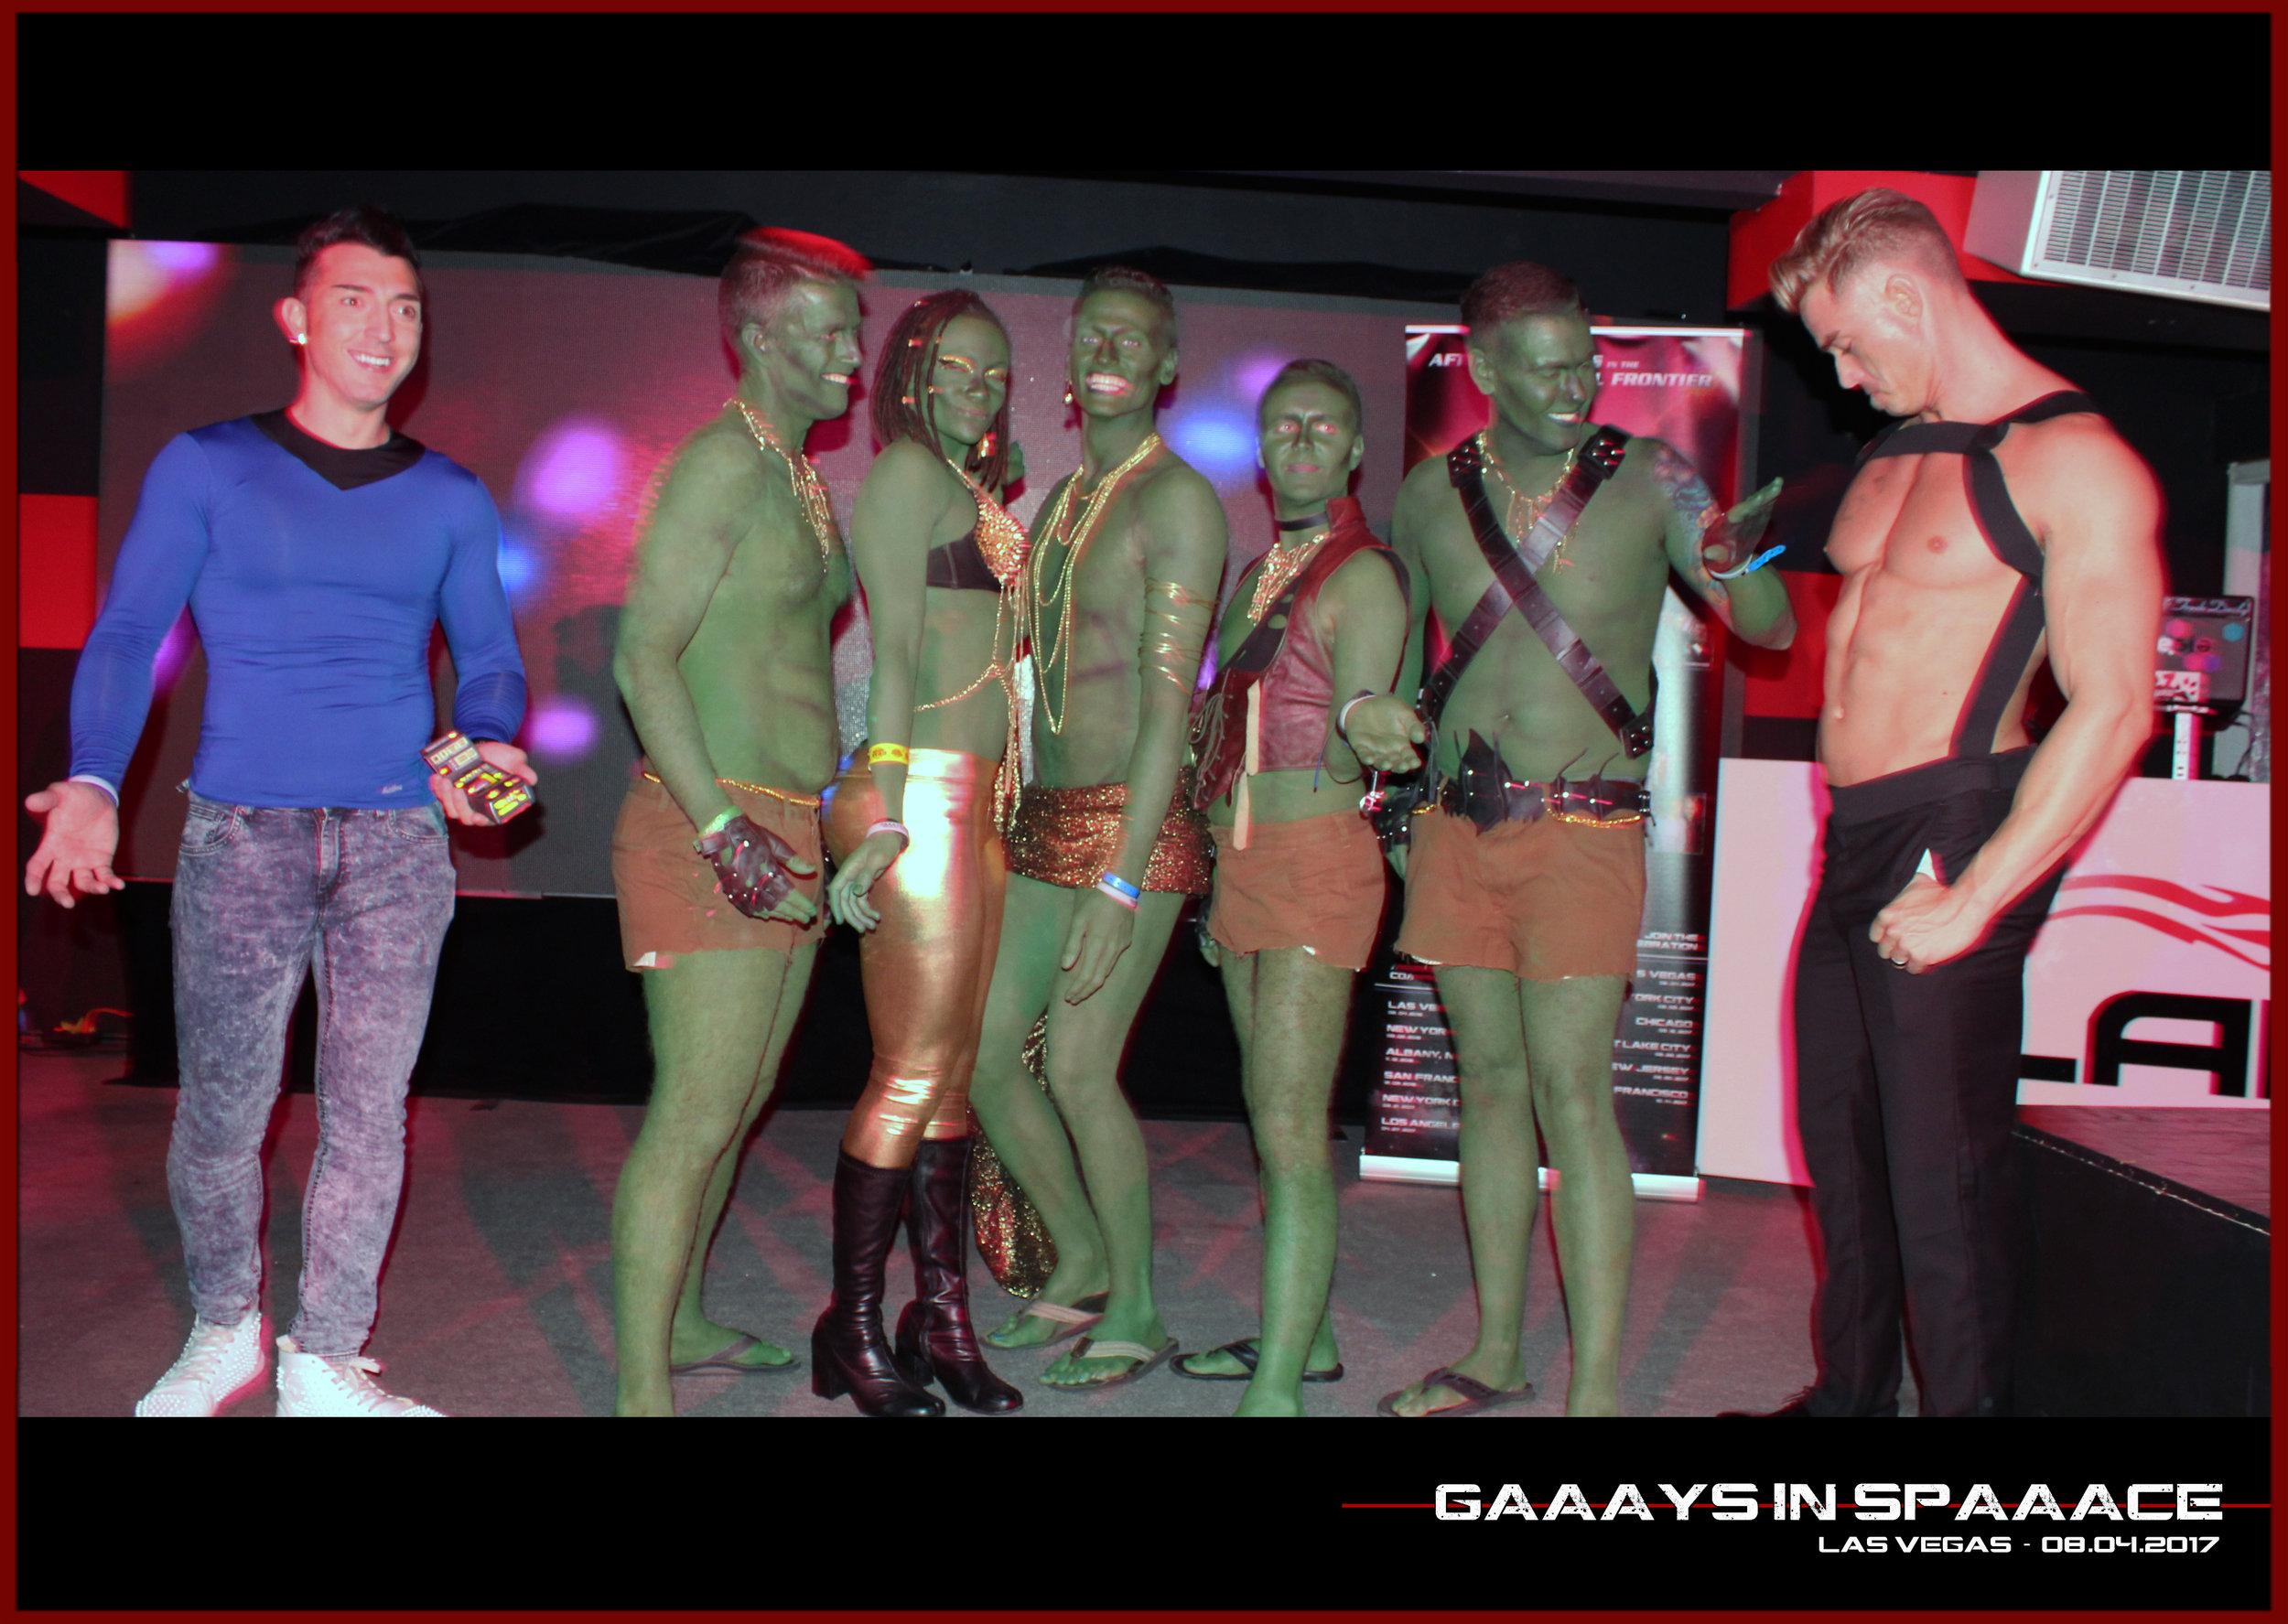 55-GIS-VEGAS-8-4-17-TheOrionSlaveBoys-JimmyDurano-ChazVorrias-on-Stage.jpg